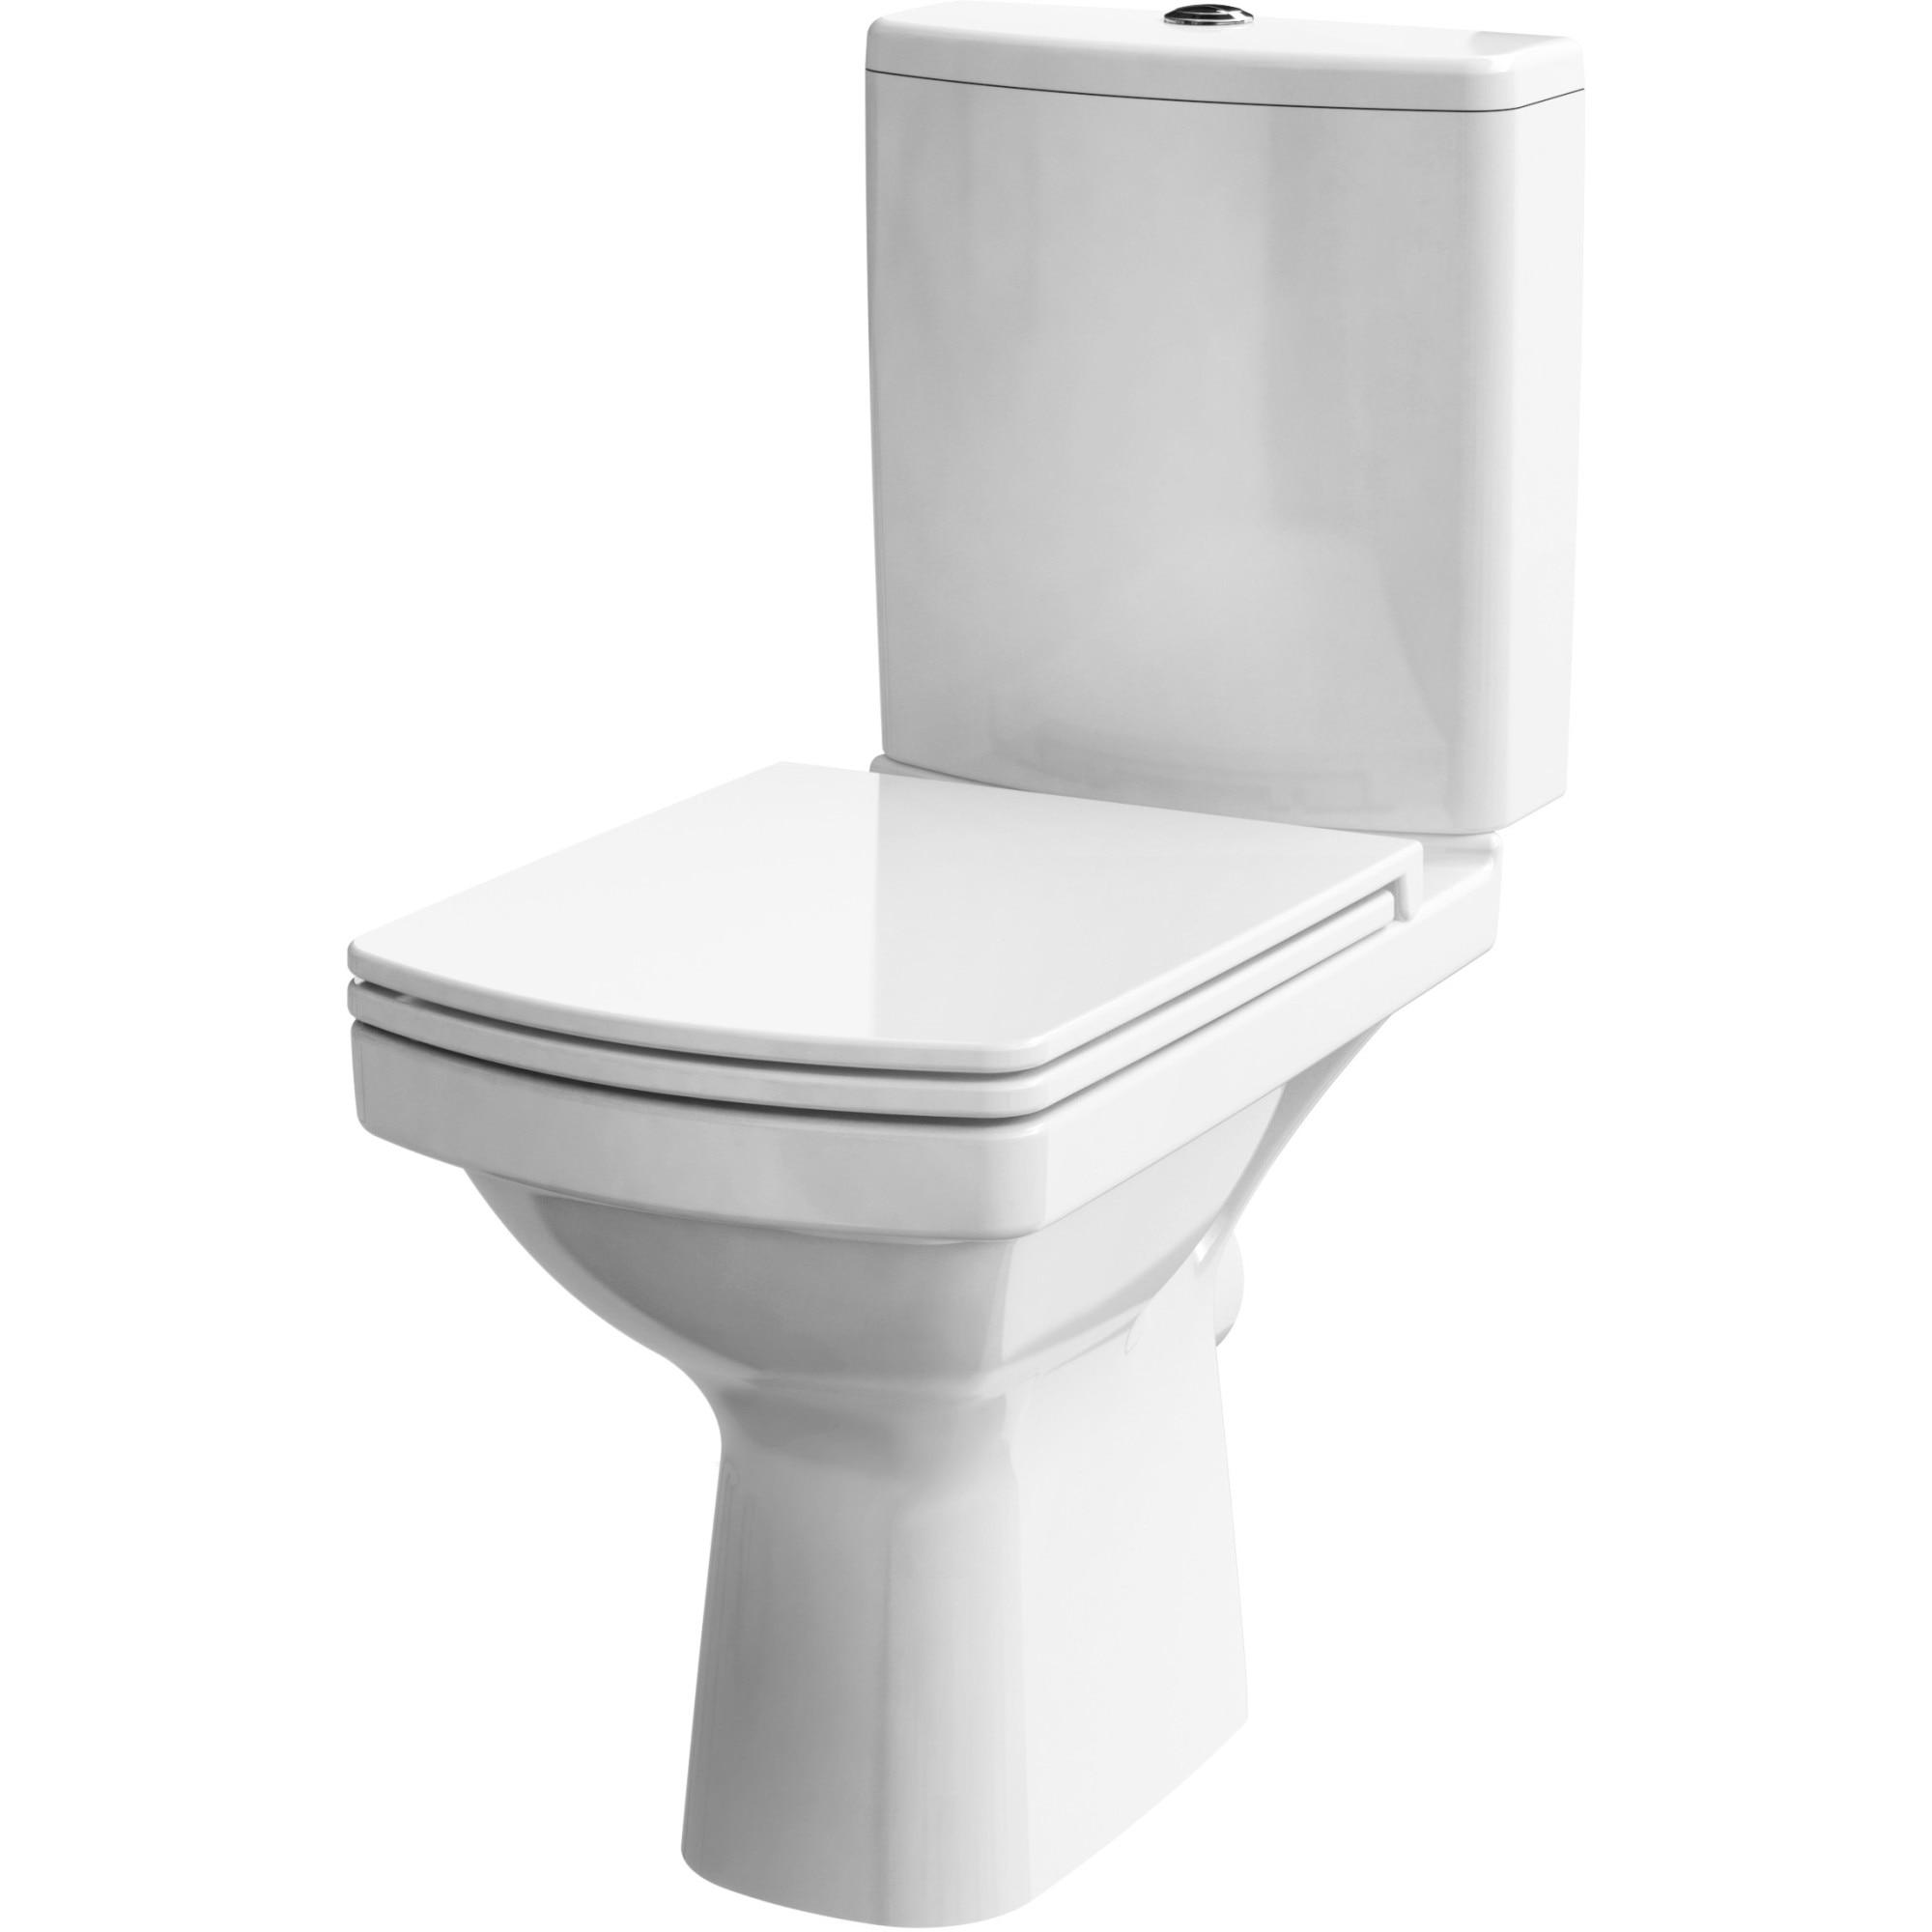 Fotografie Pachet Cesanit K102-028, vas WC compact, Clean On + rezervor + capac WC Duroplast, antibacterial, inchidere lenta